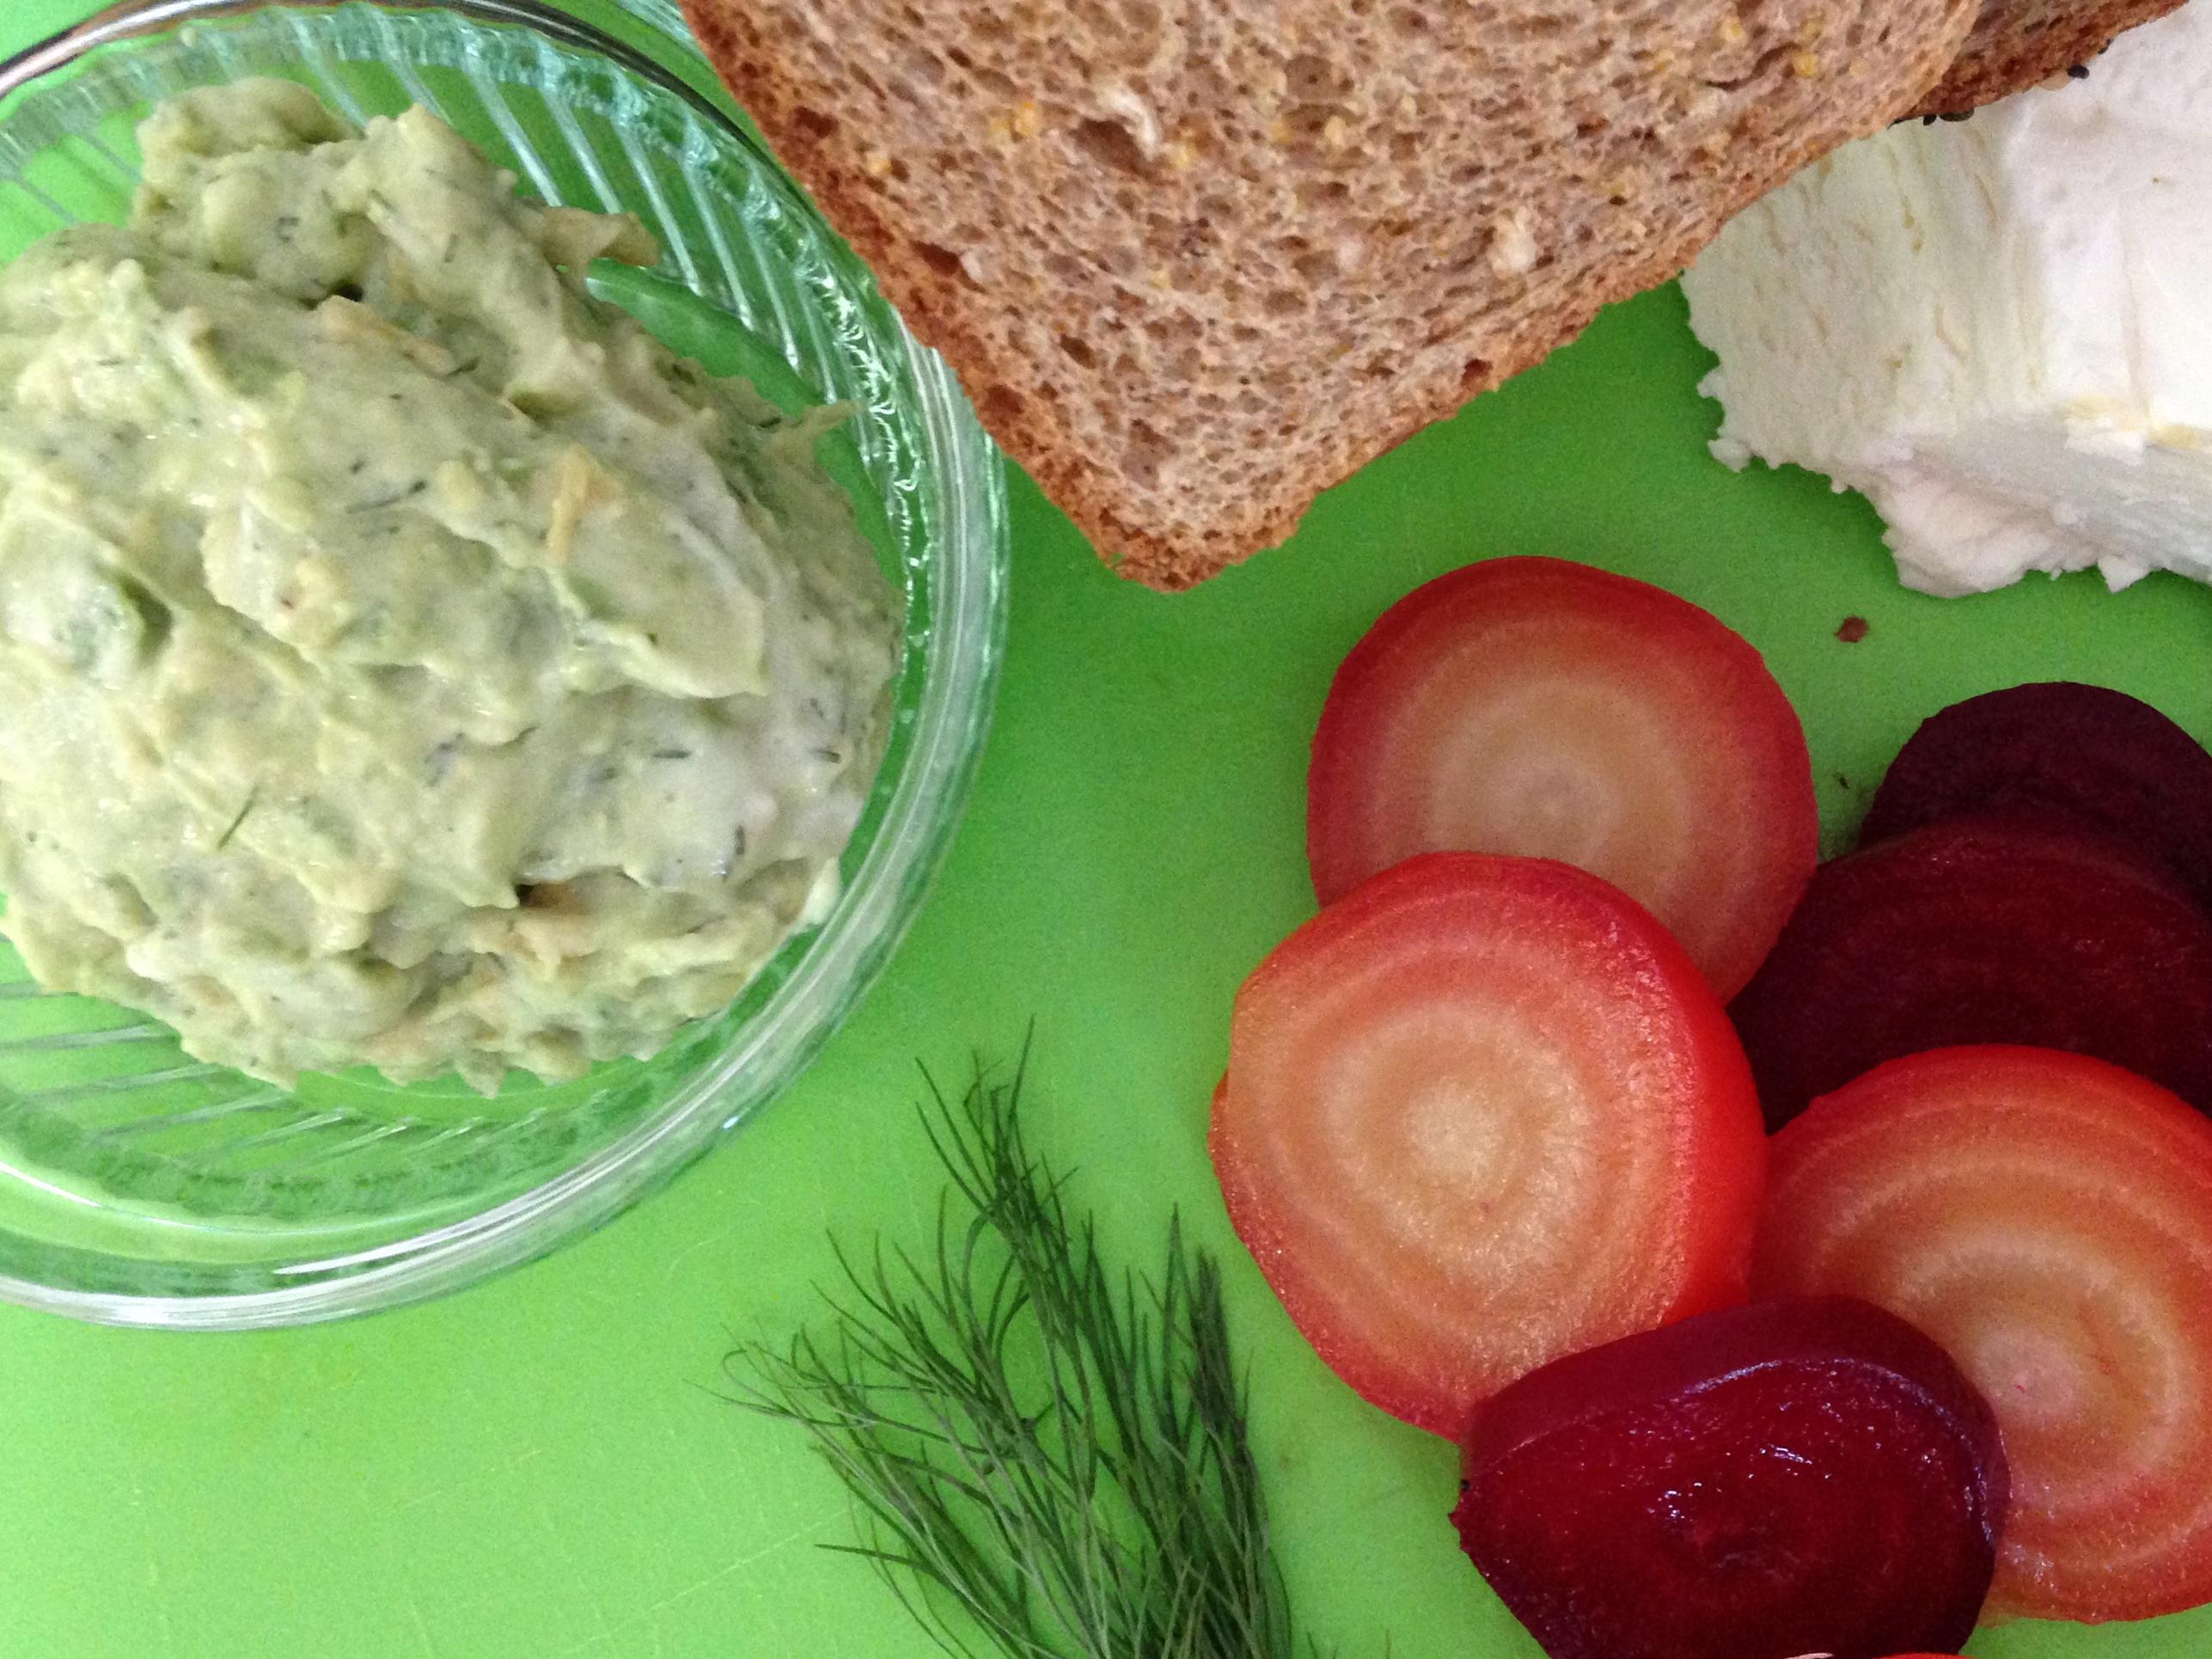 ingredients for beet sandwich